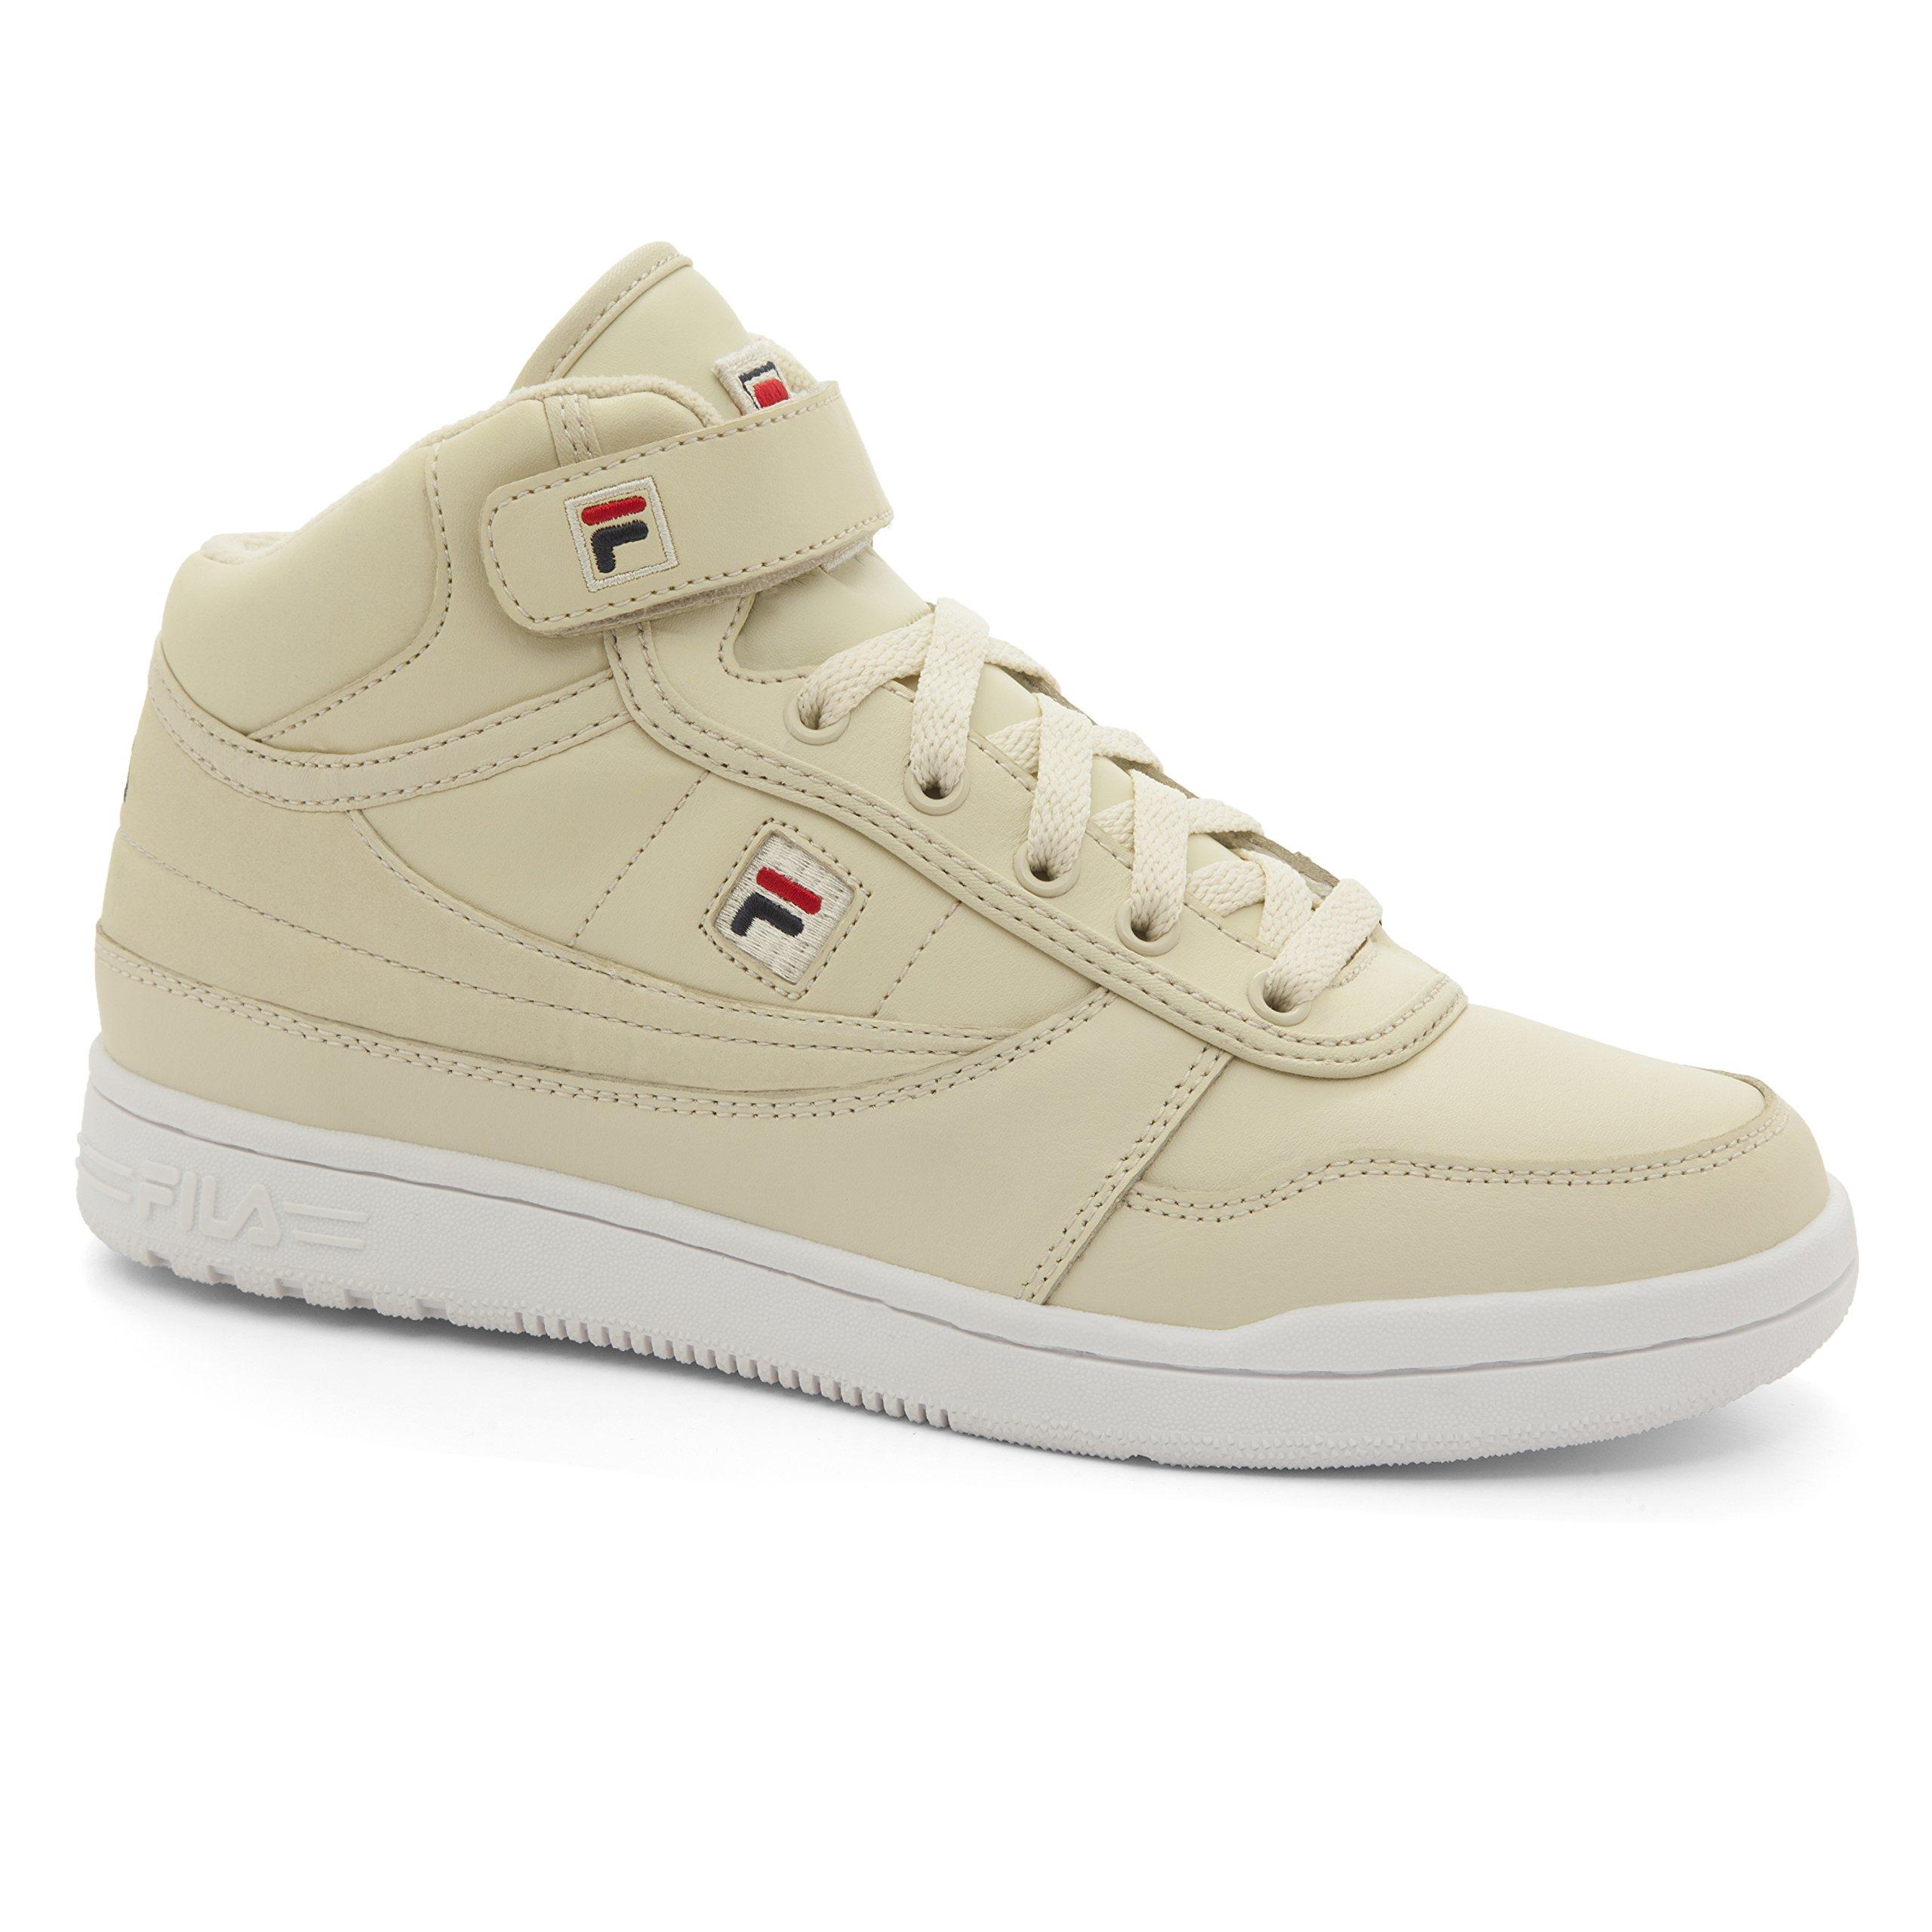 Fila Women's BBN 84 2 Walking Shoe, Cream Navy Red, 8 B US